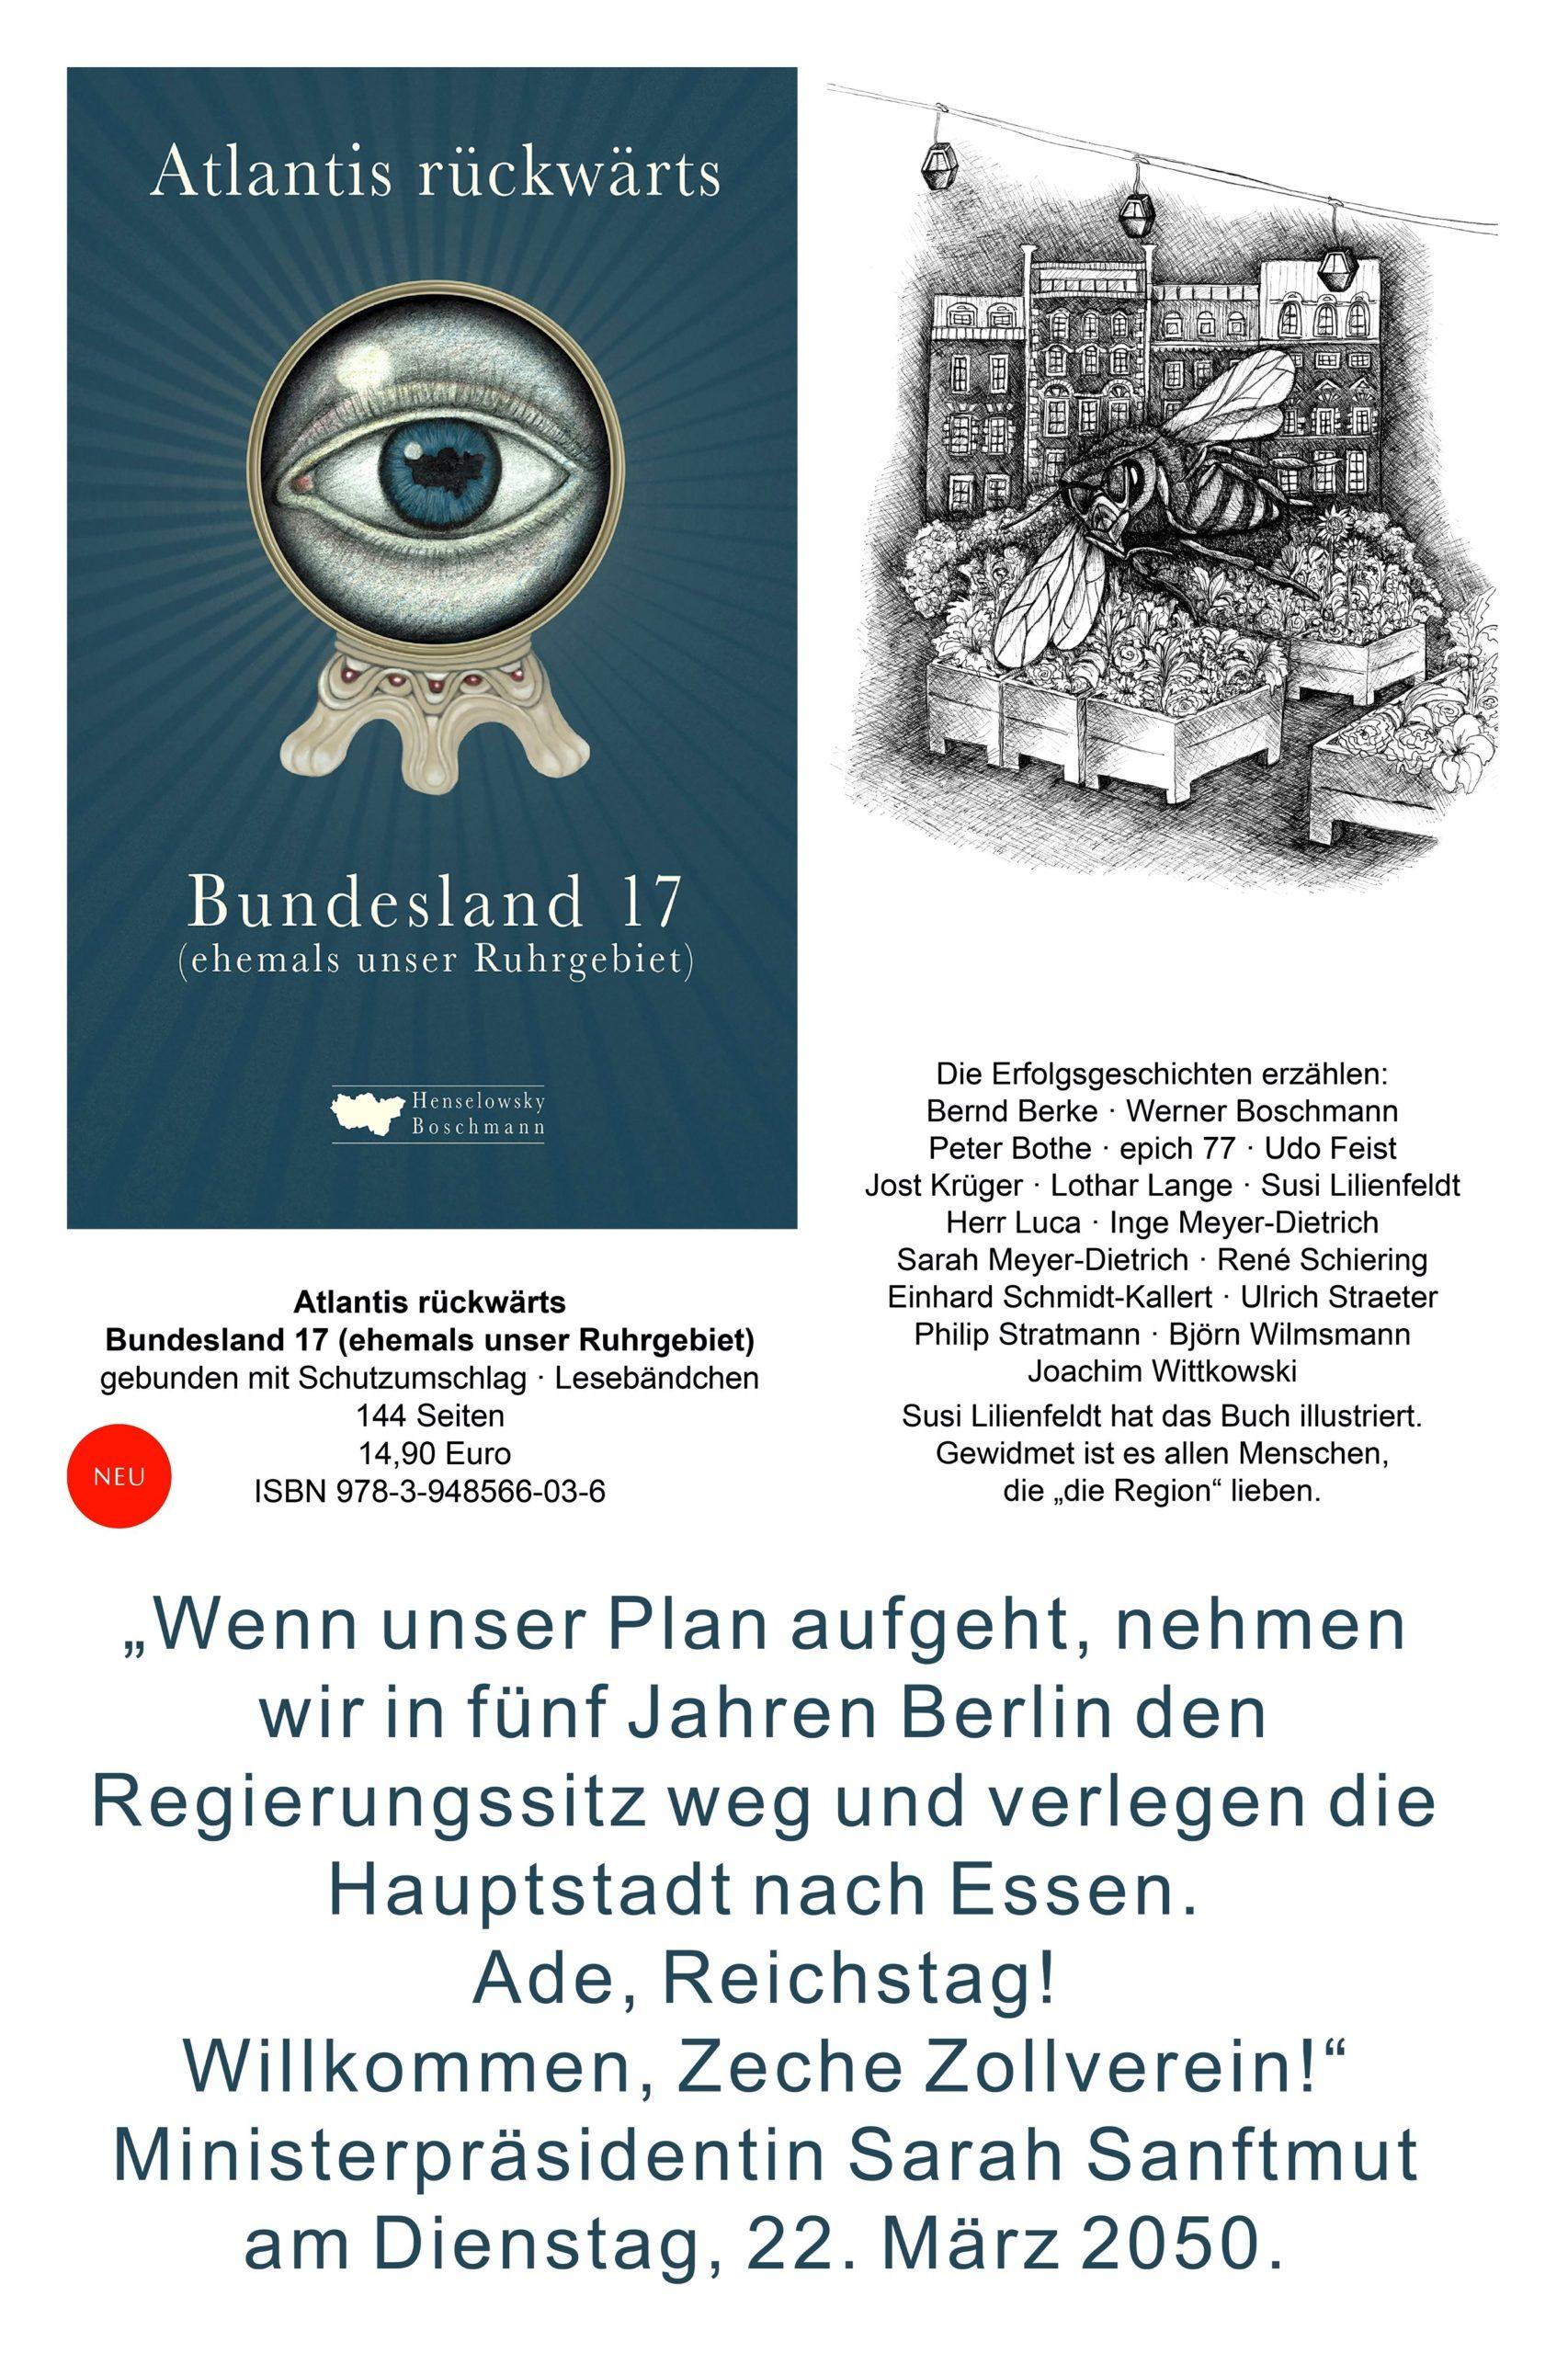 17. Bundesland